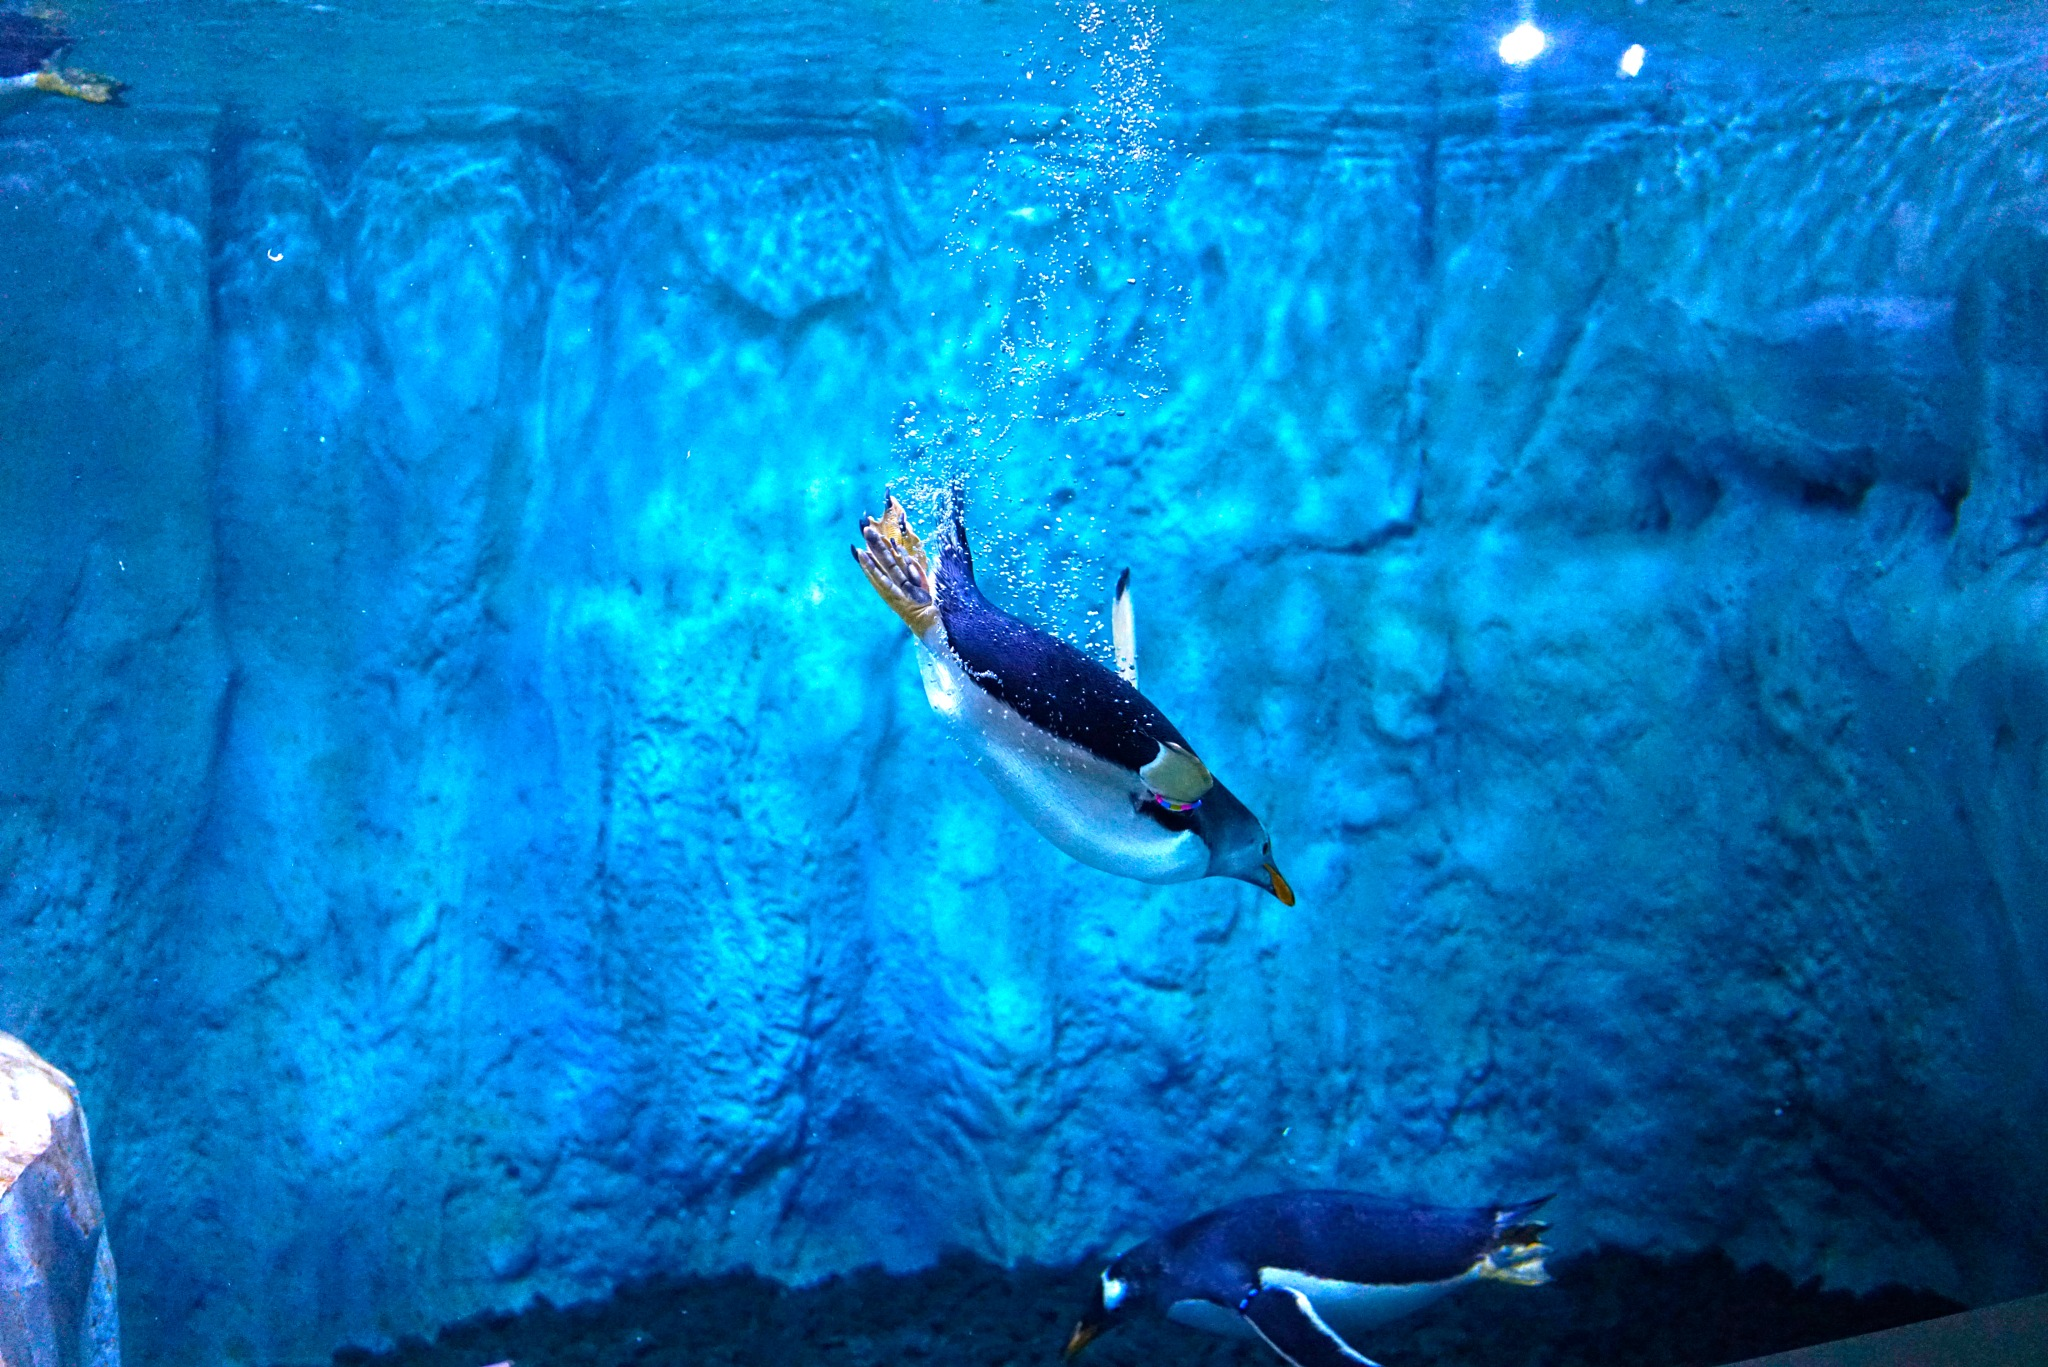 Pinguins by Blackhawk